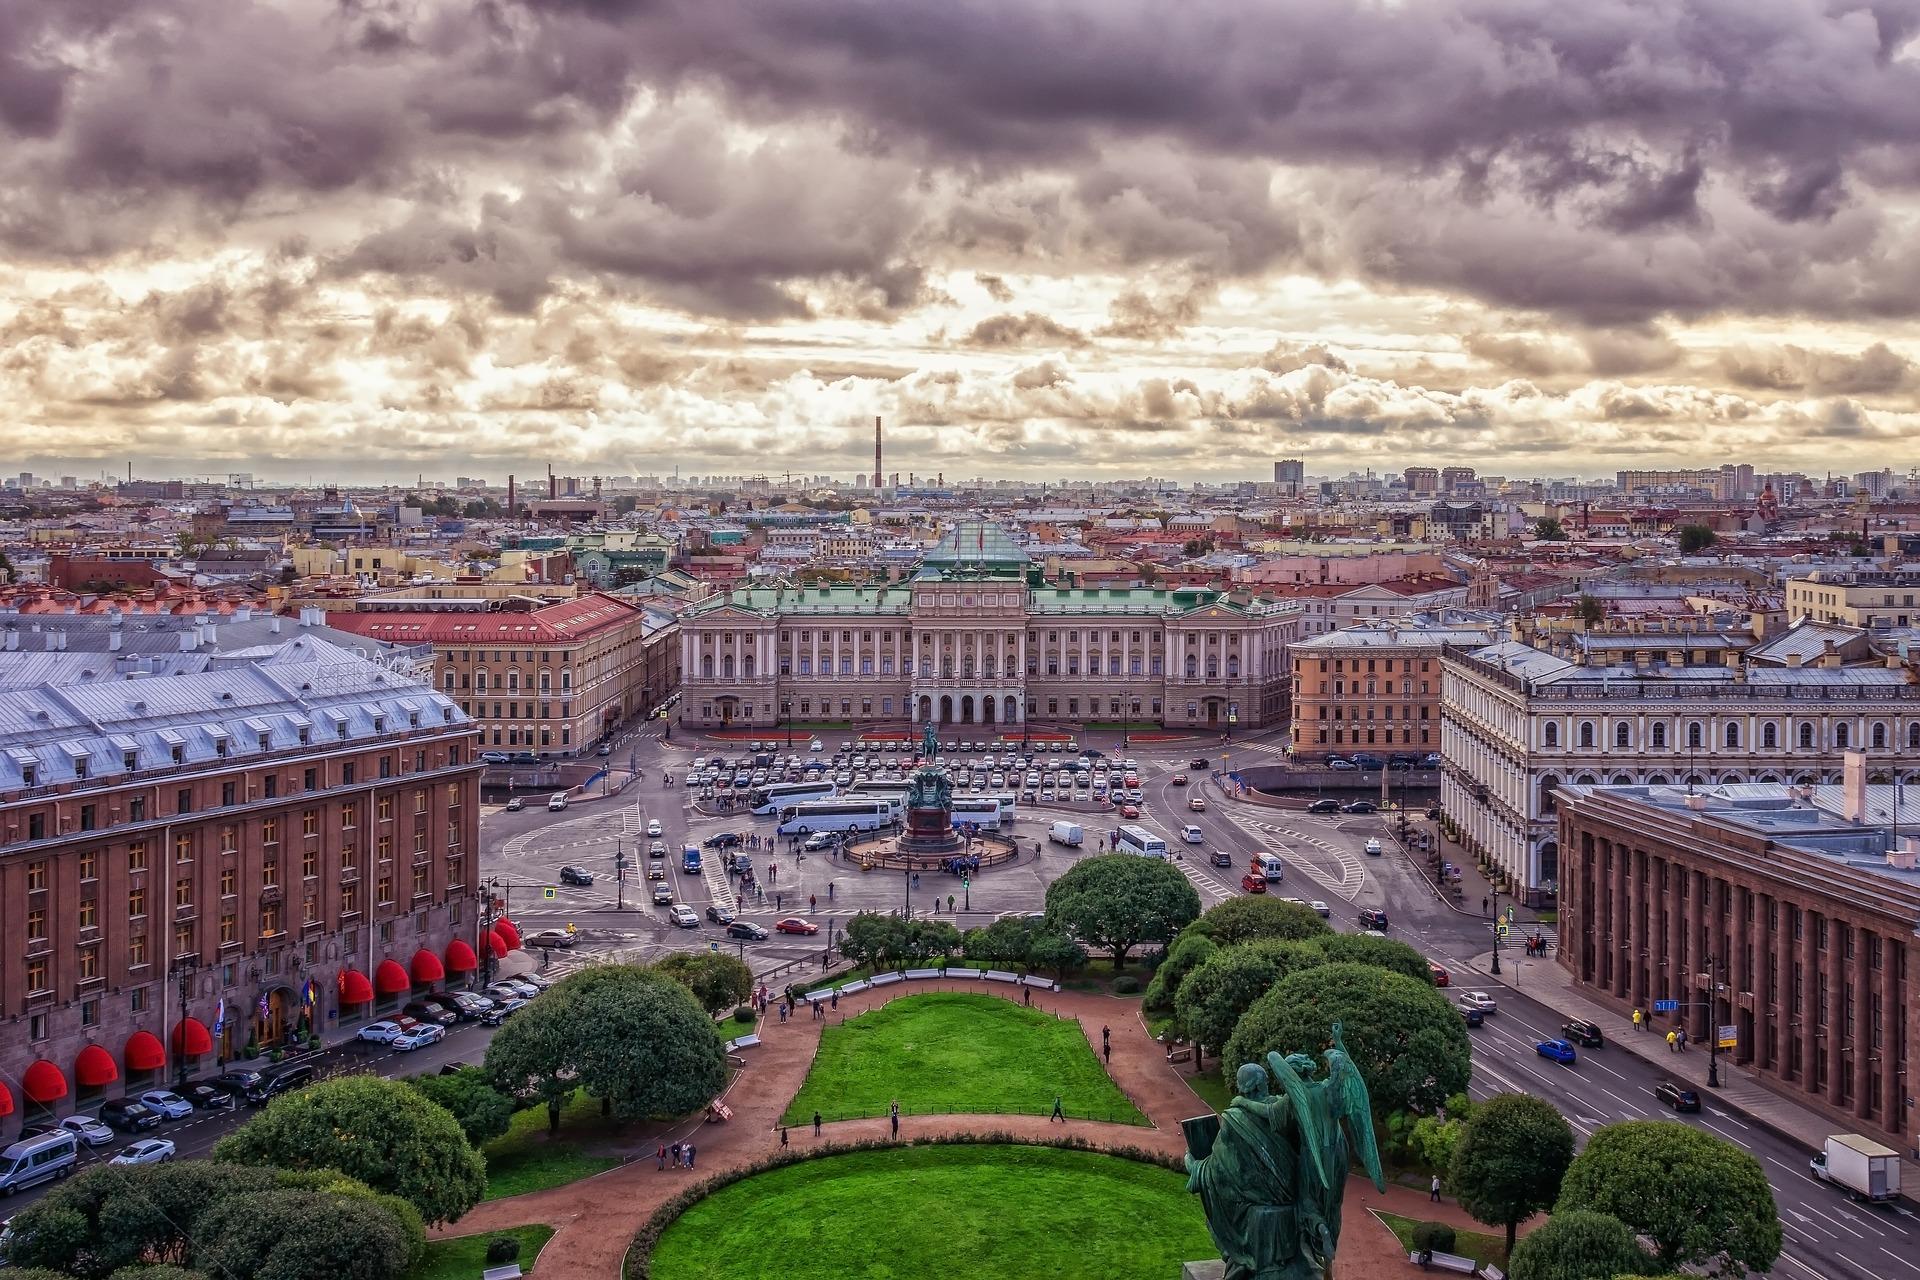 St. Petersburg, Russa